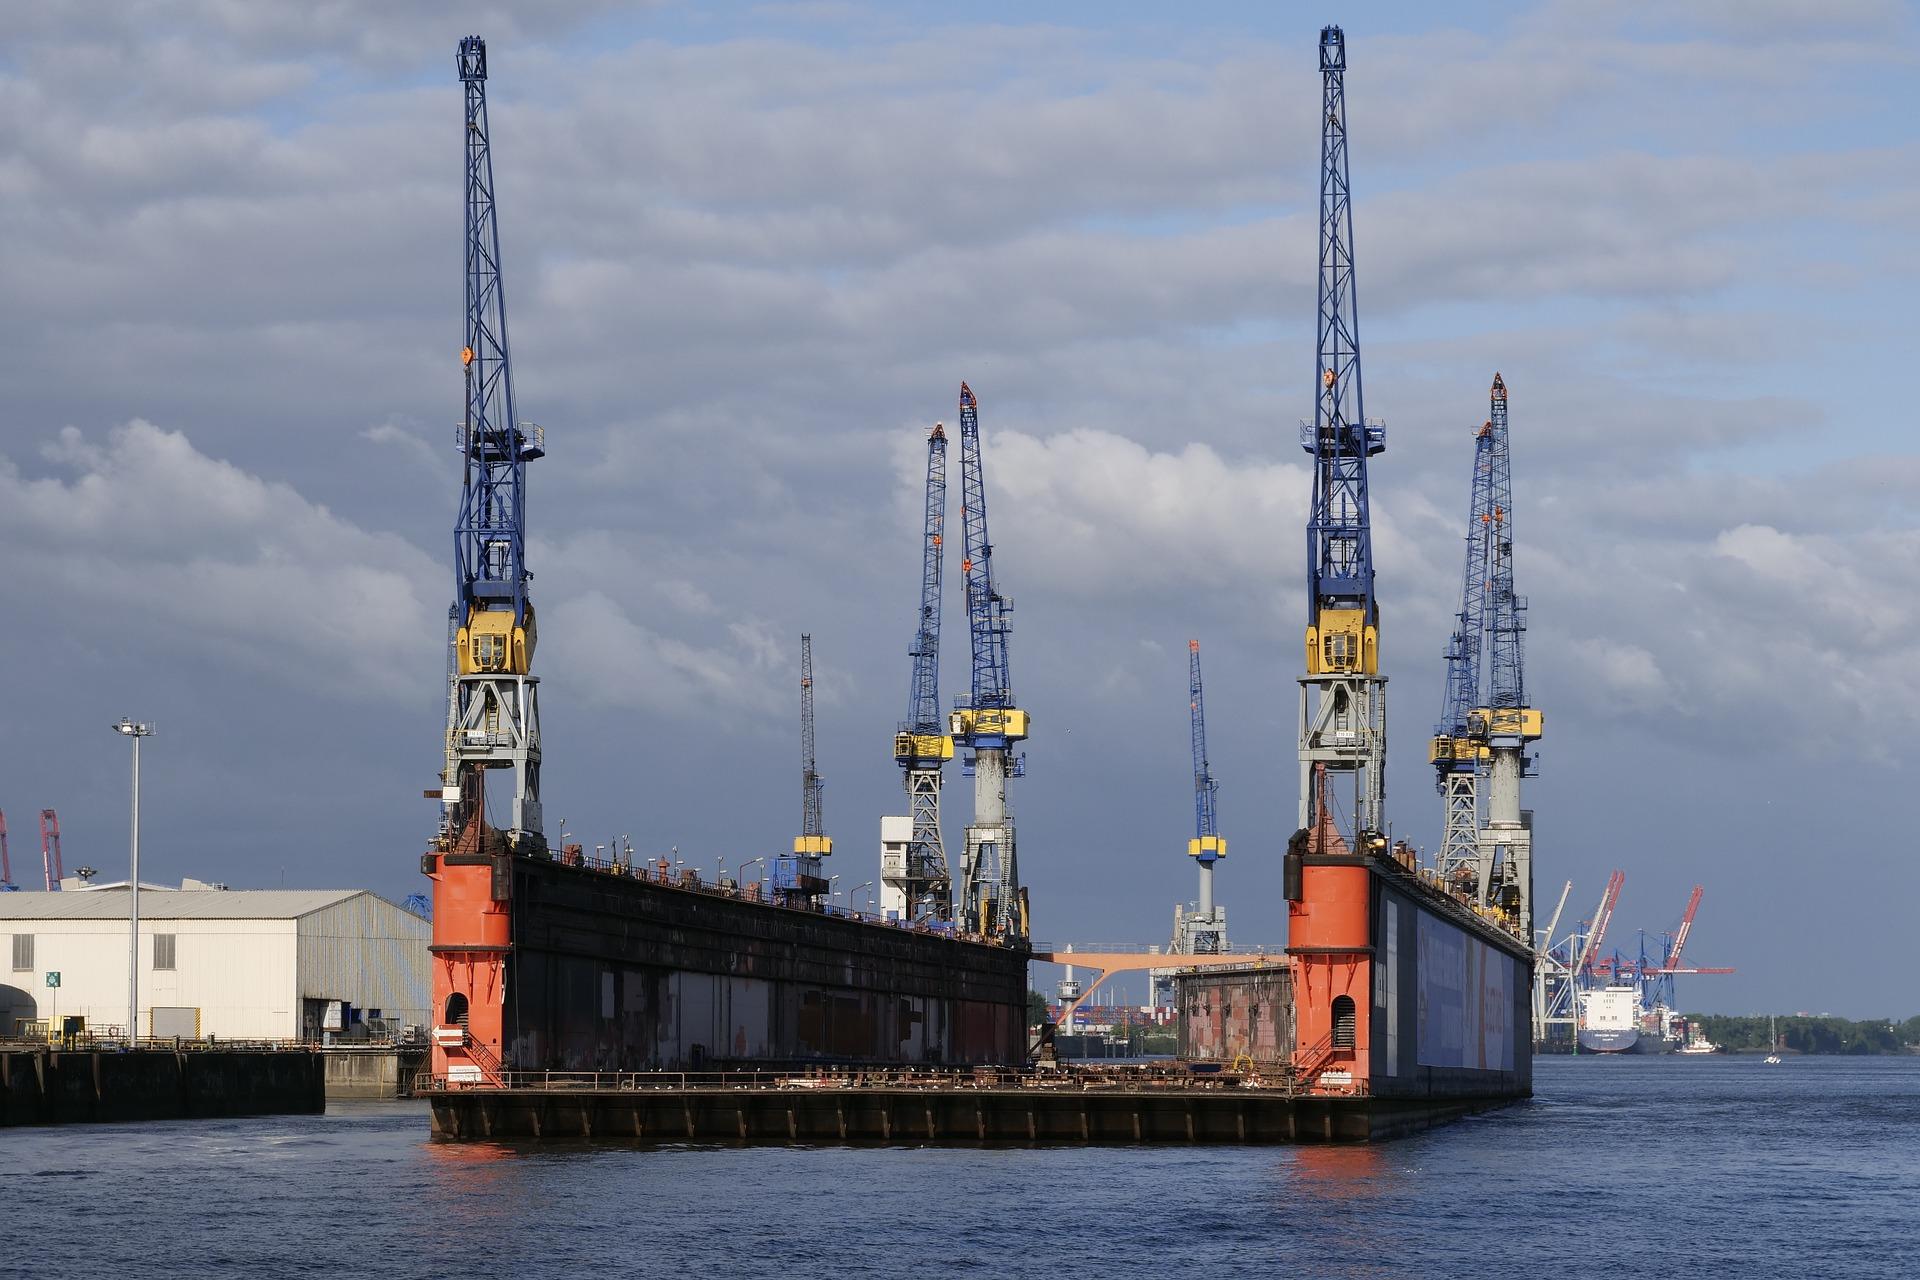 Danaos for marine engieering